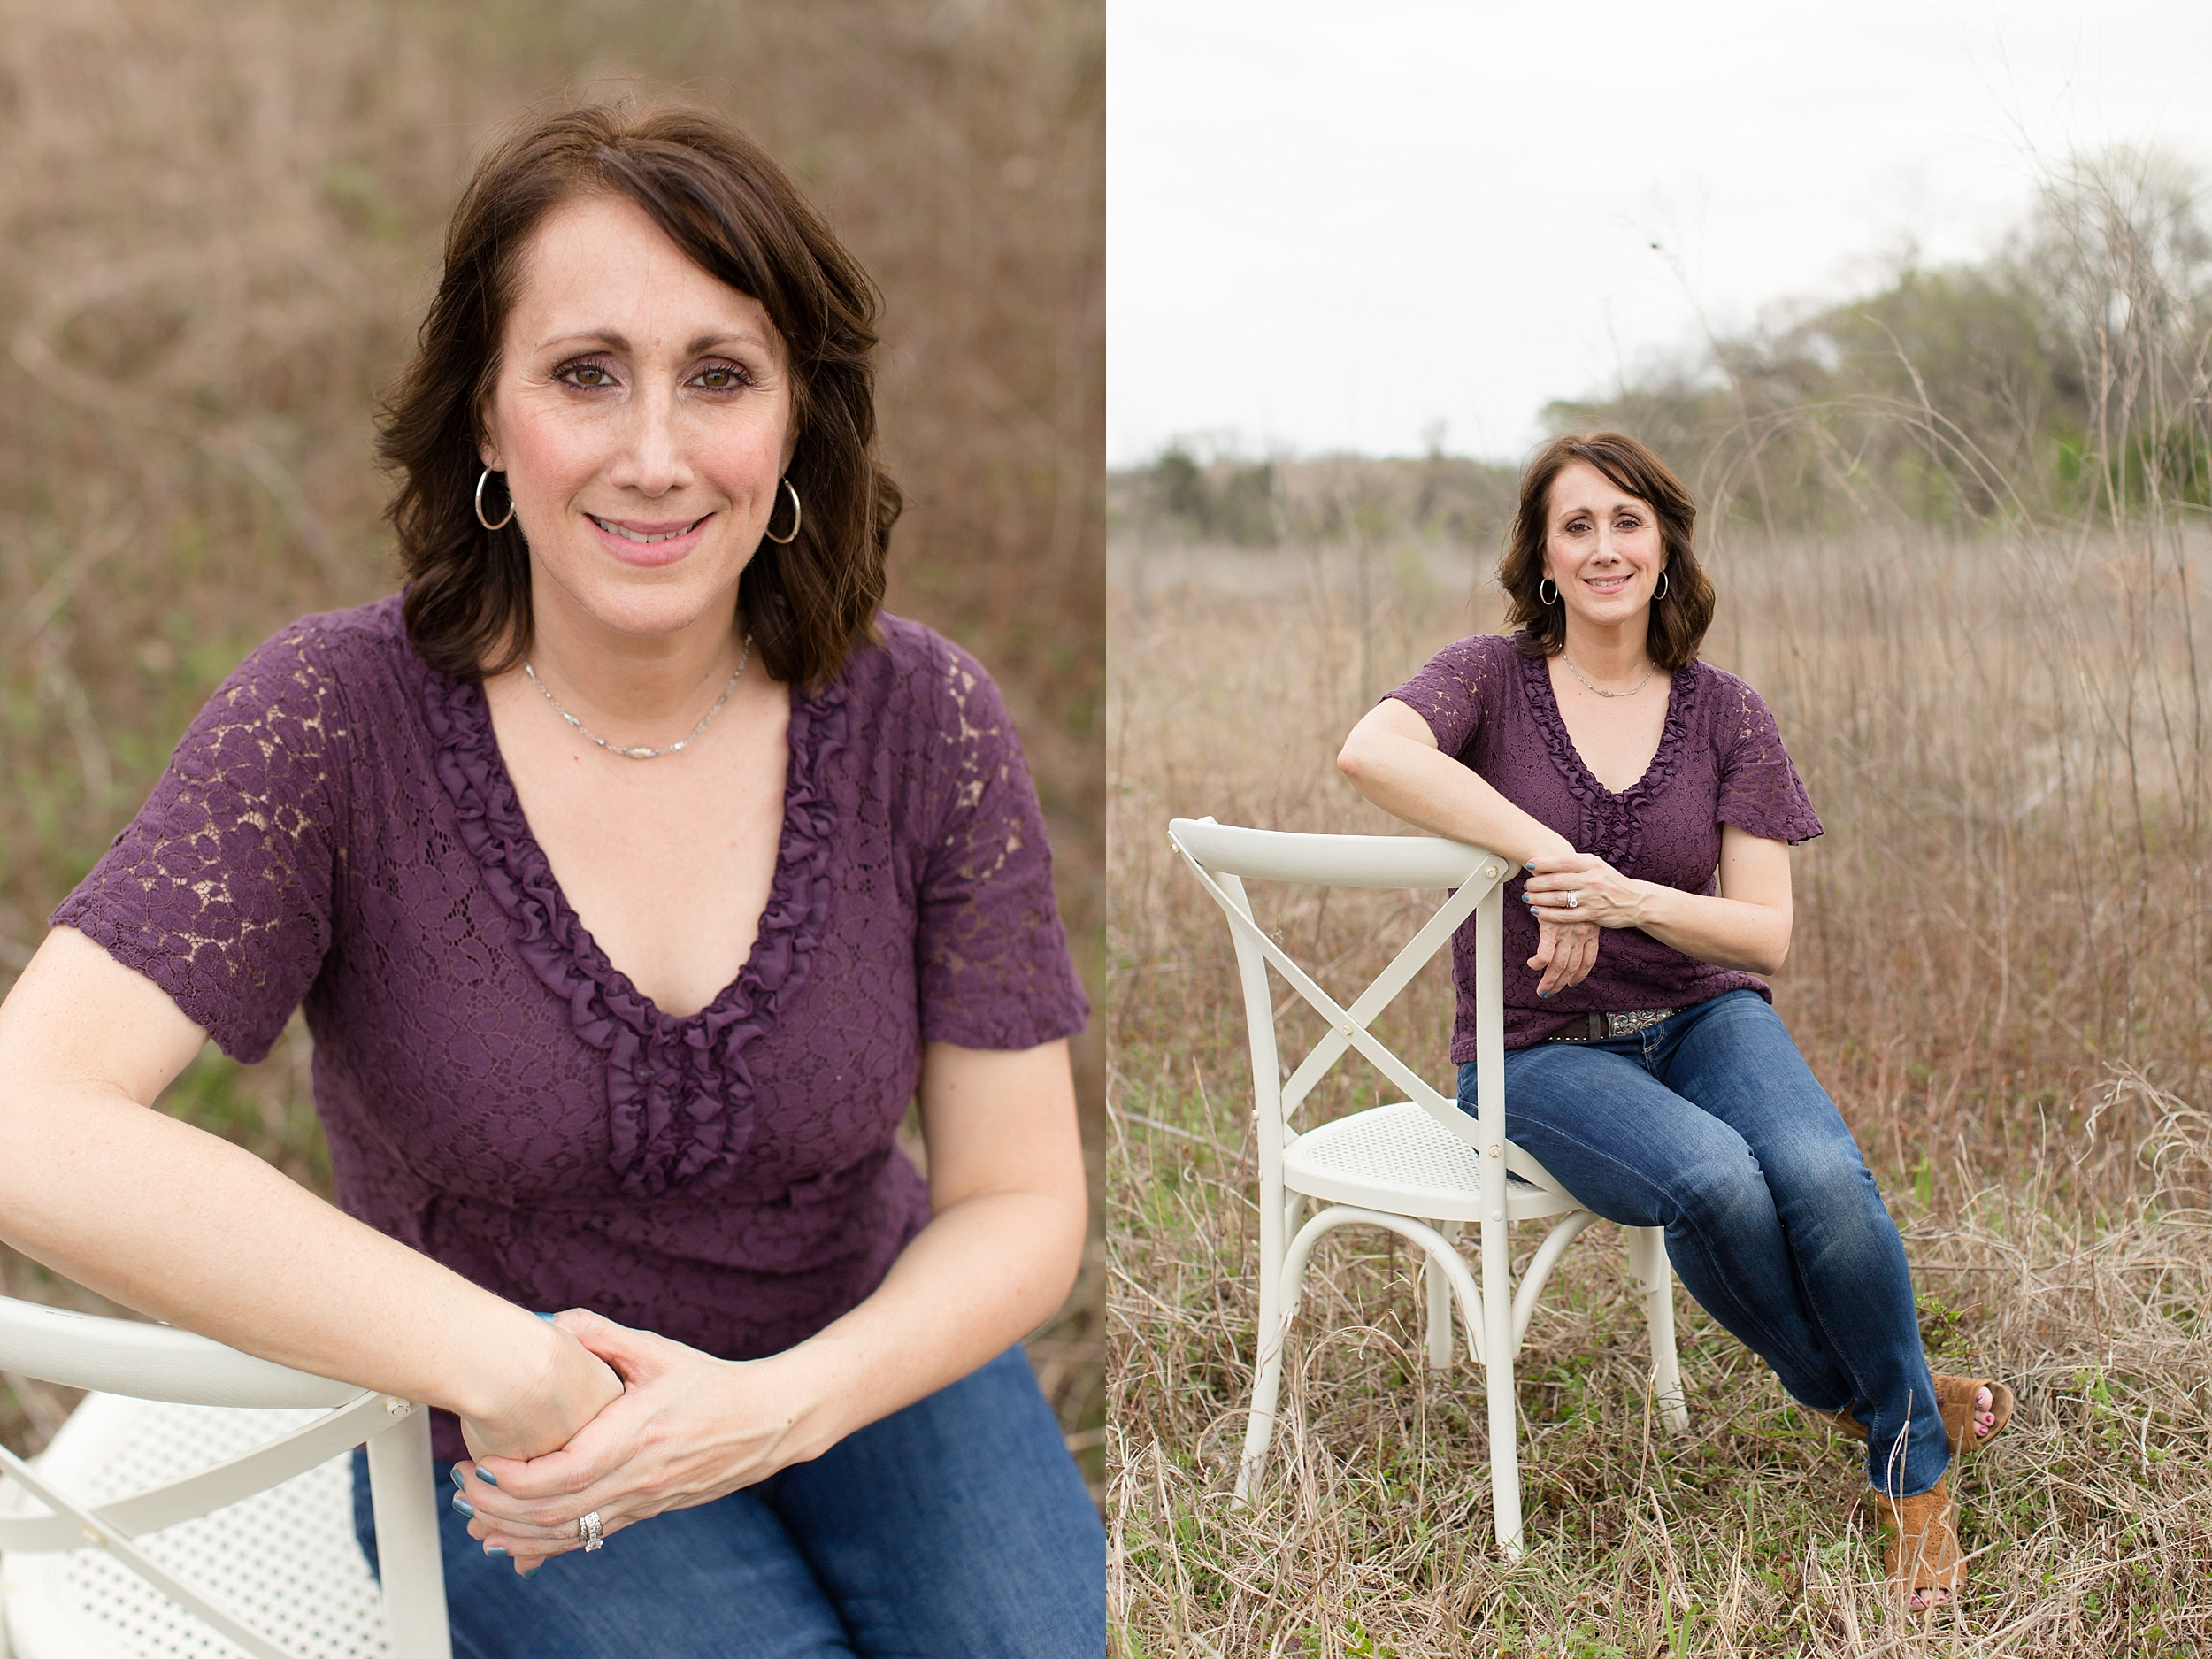 Landon-Schneider-Photography-Portrait-Session-Texas_0010.jpg